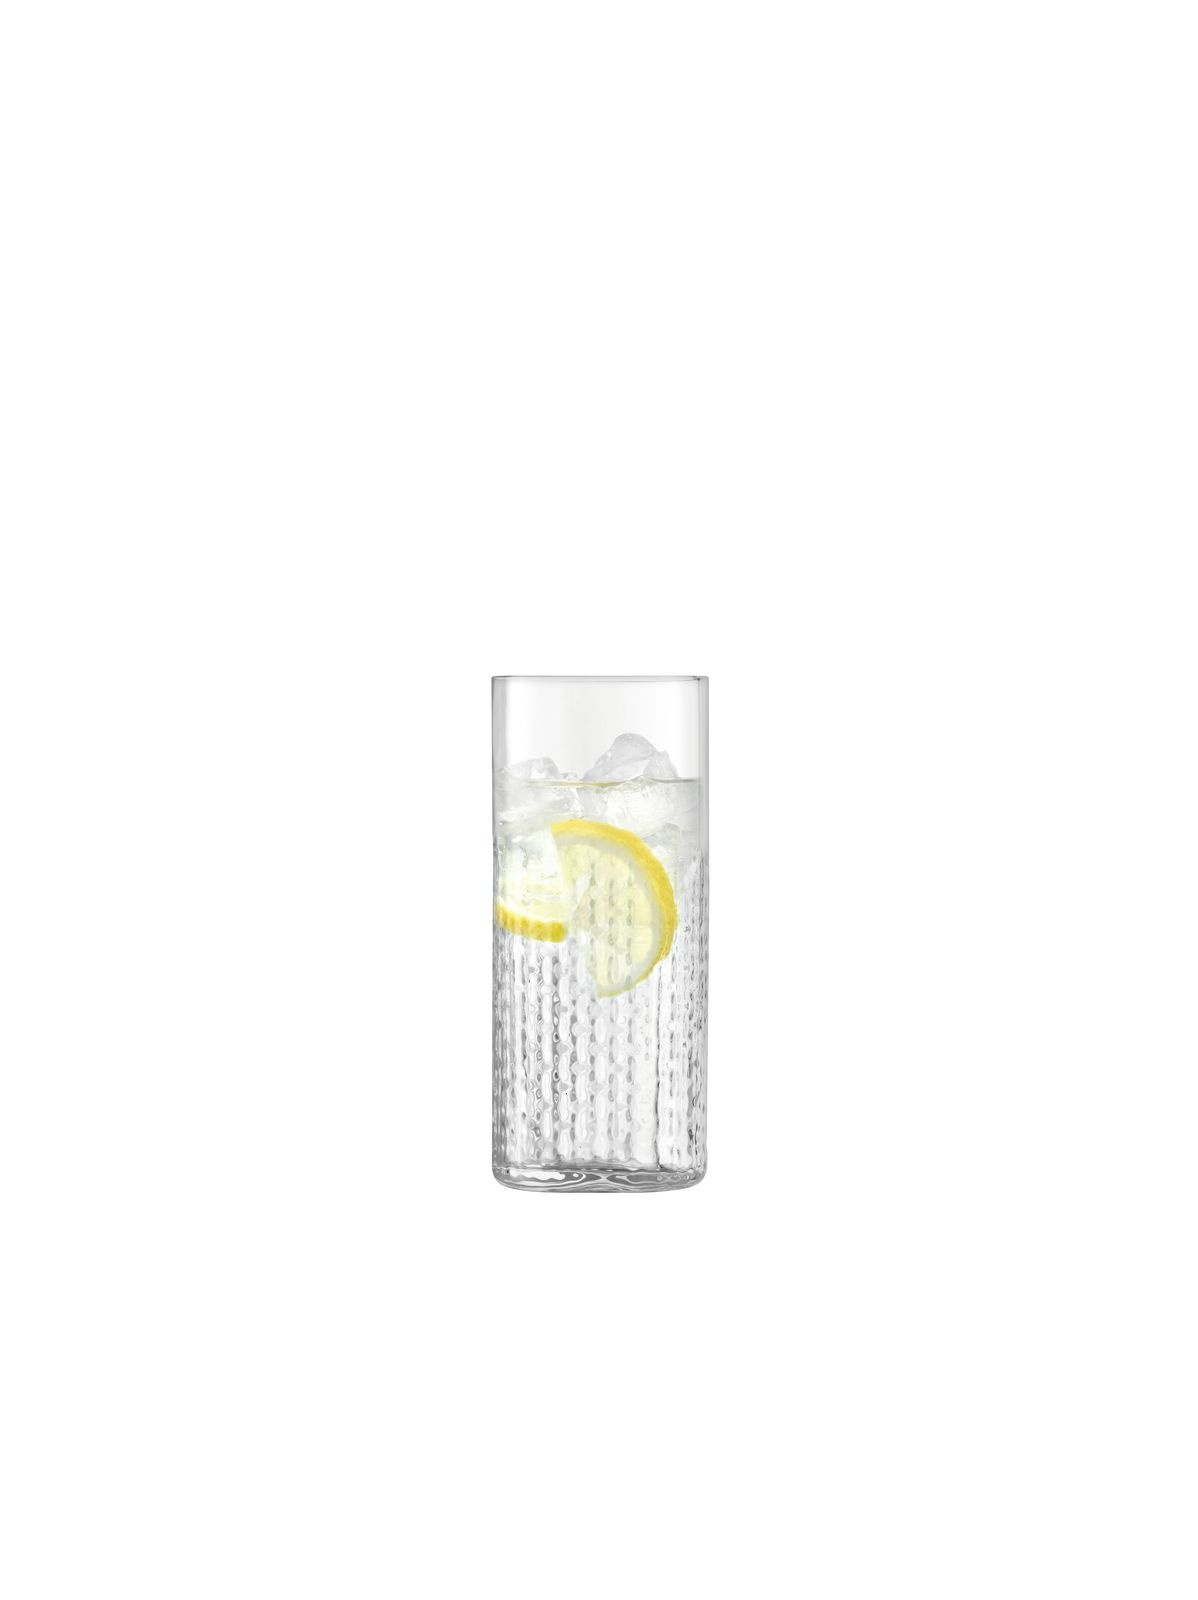 L.S.A. Wicker Glas Highball 400 ml Set van 2 Stuks